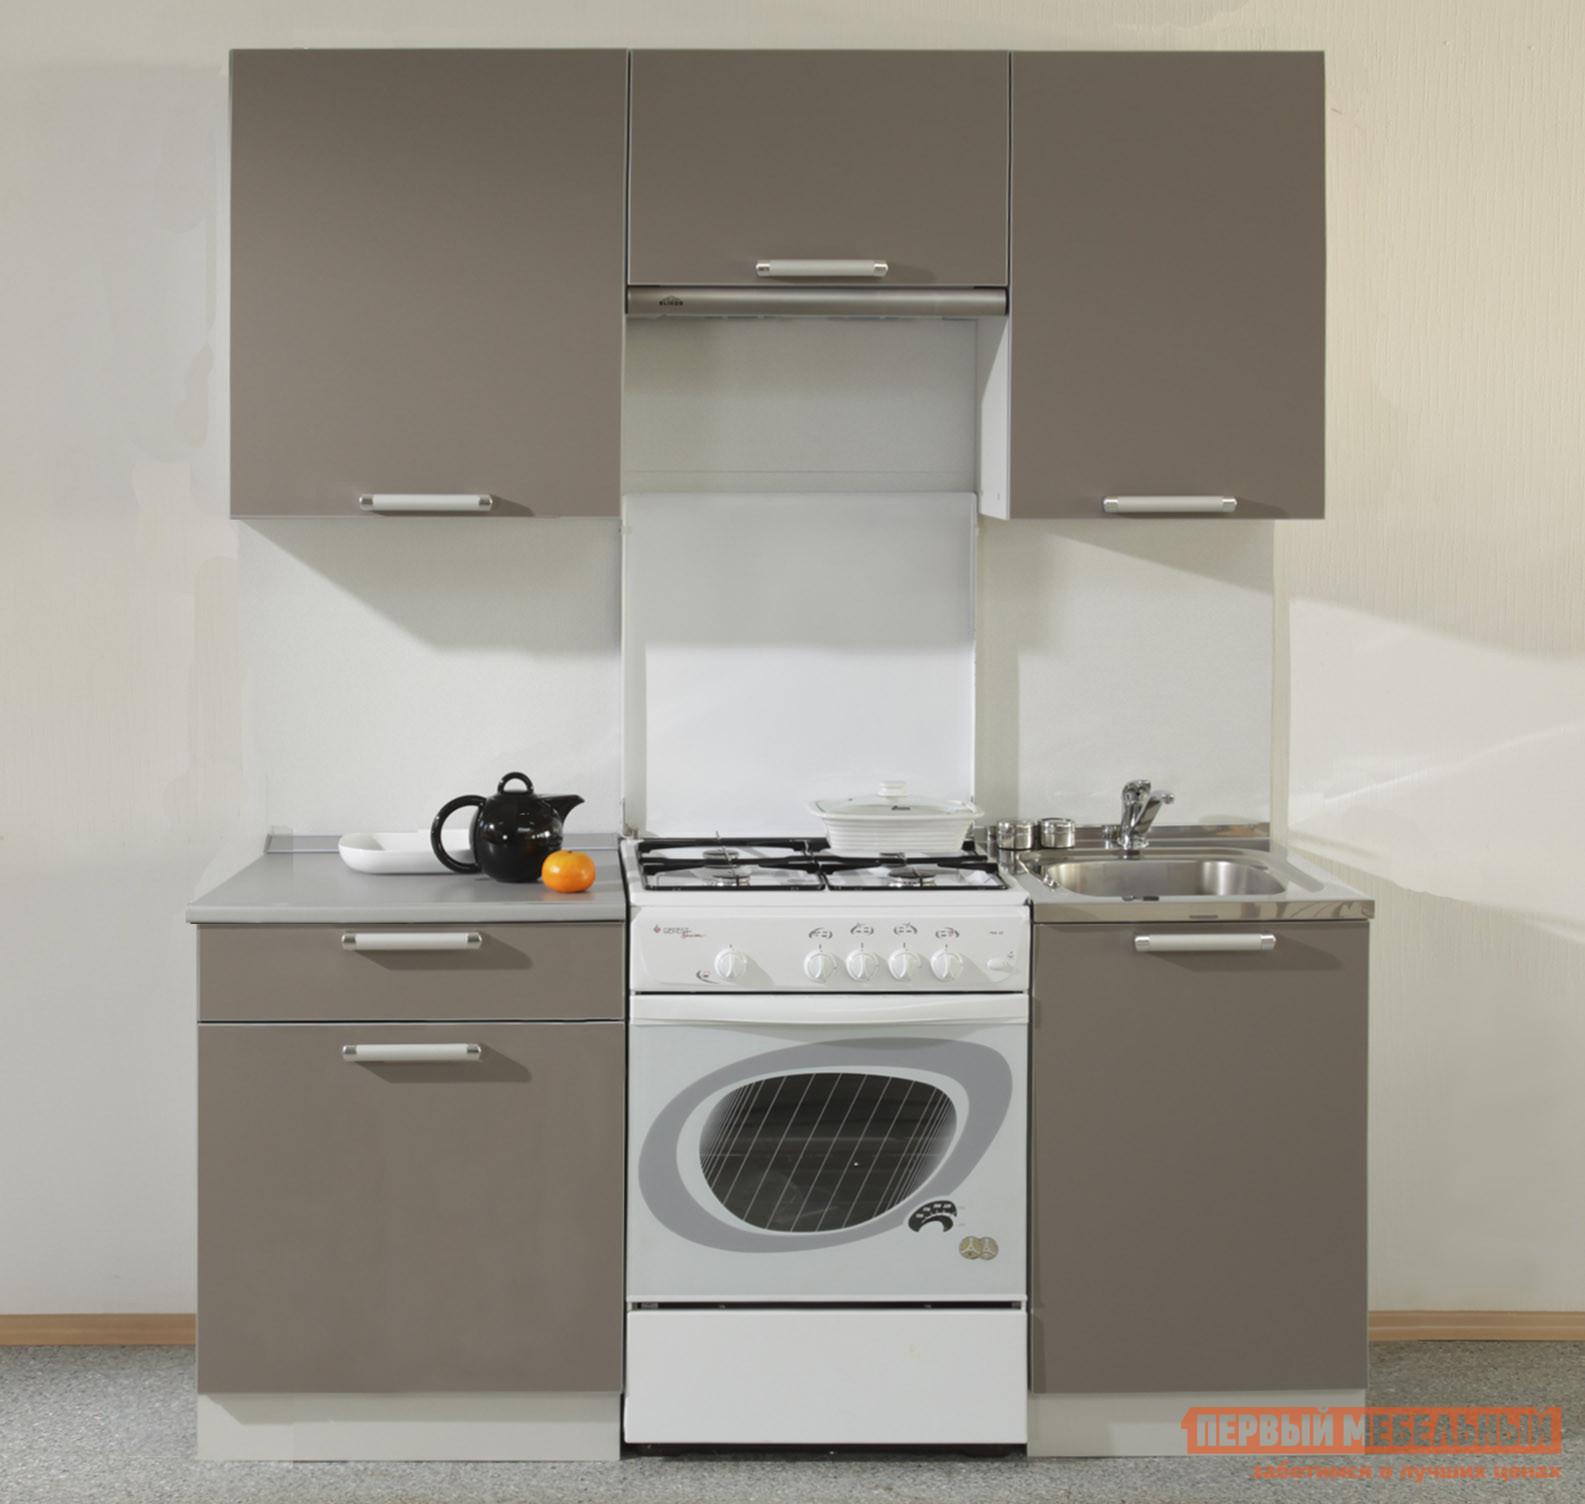 Кухонный гарнитур Боровичи Симпл 1700 мм деревянный кухонный стол и стулья боровичи хатико 4 каппа